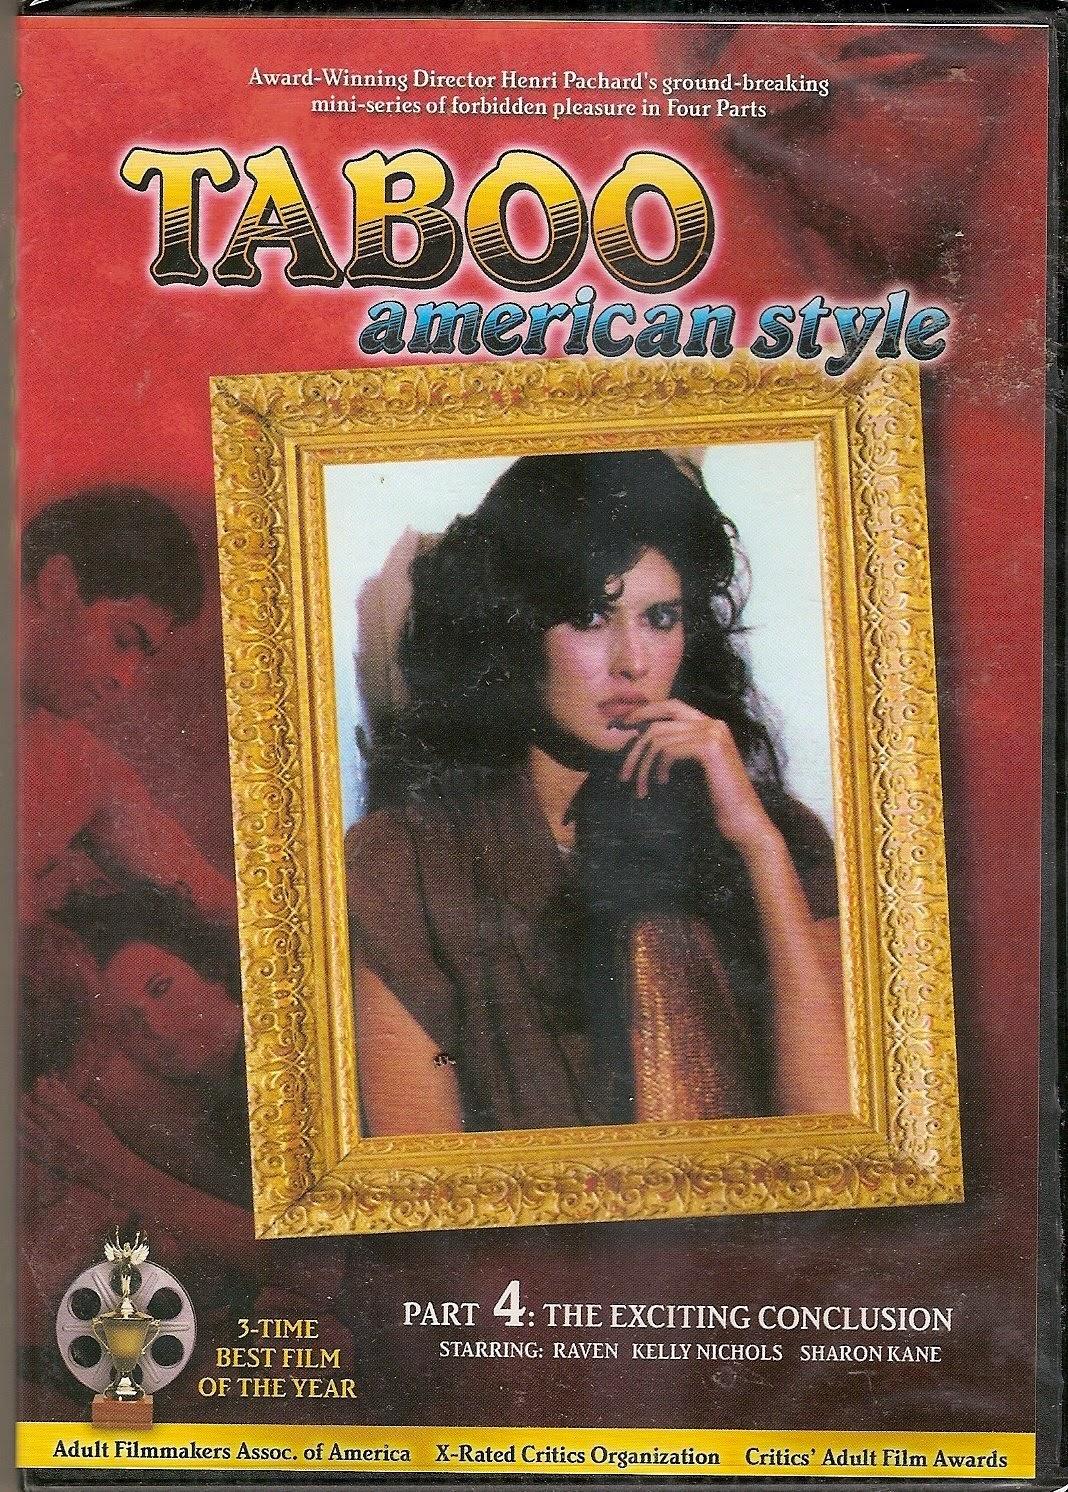 Bragueta historia 1986 - 2 part 2